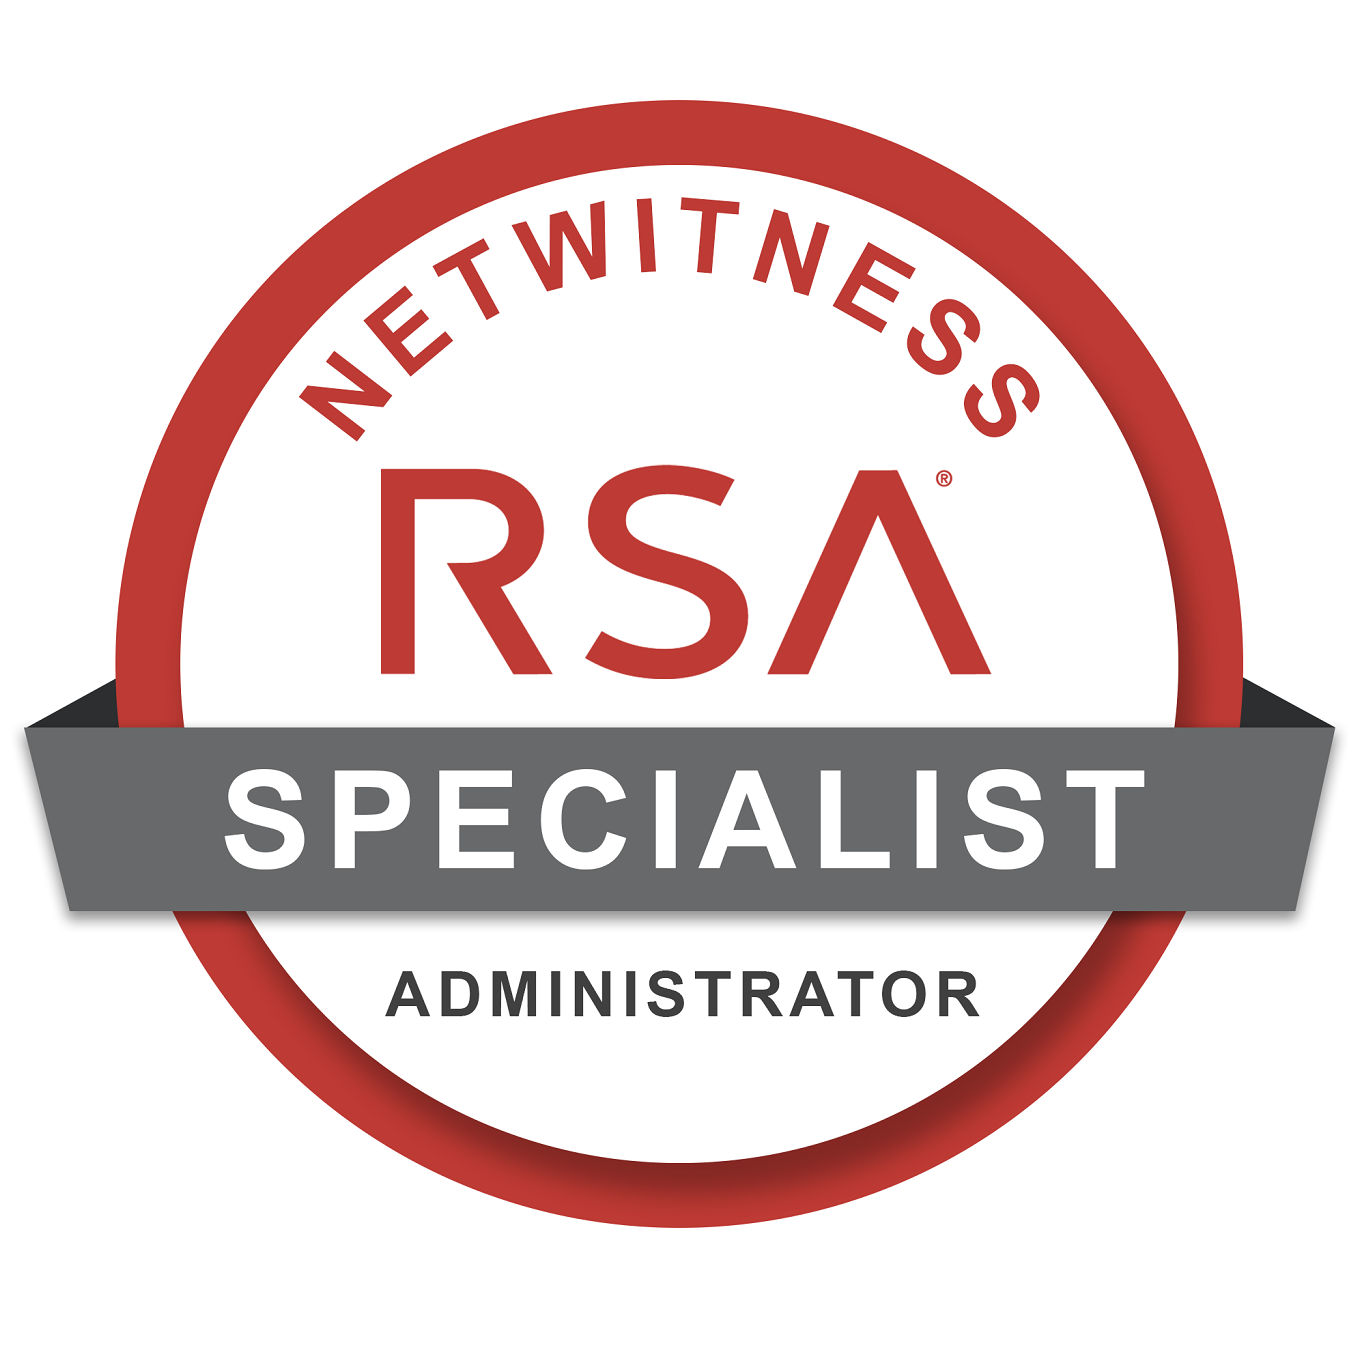 NetWitness Certified Specialist - Administrator